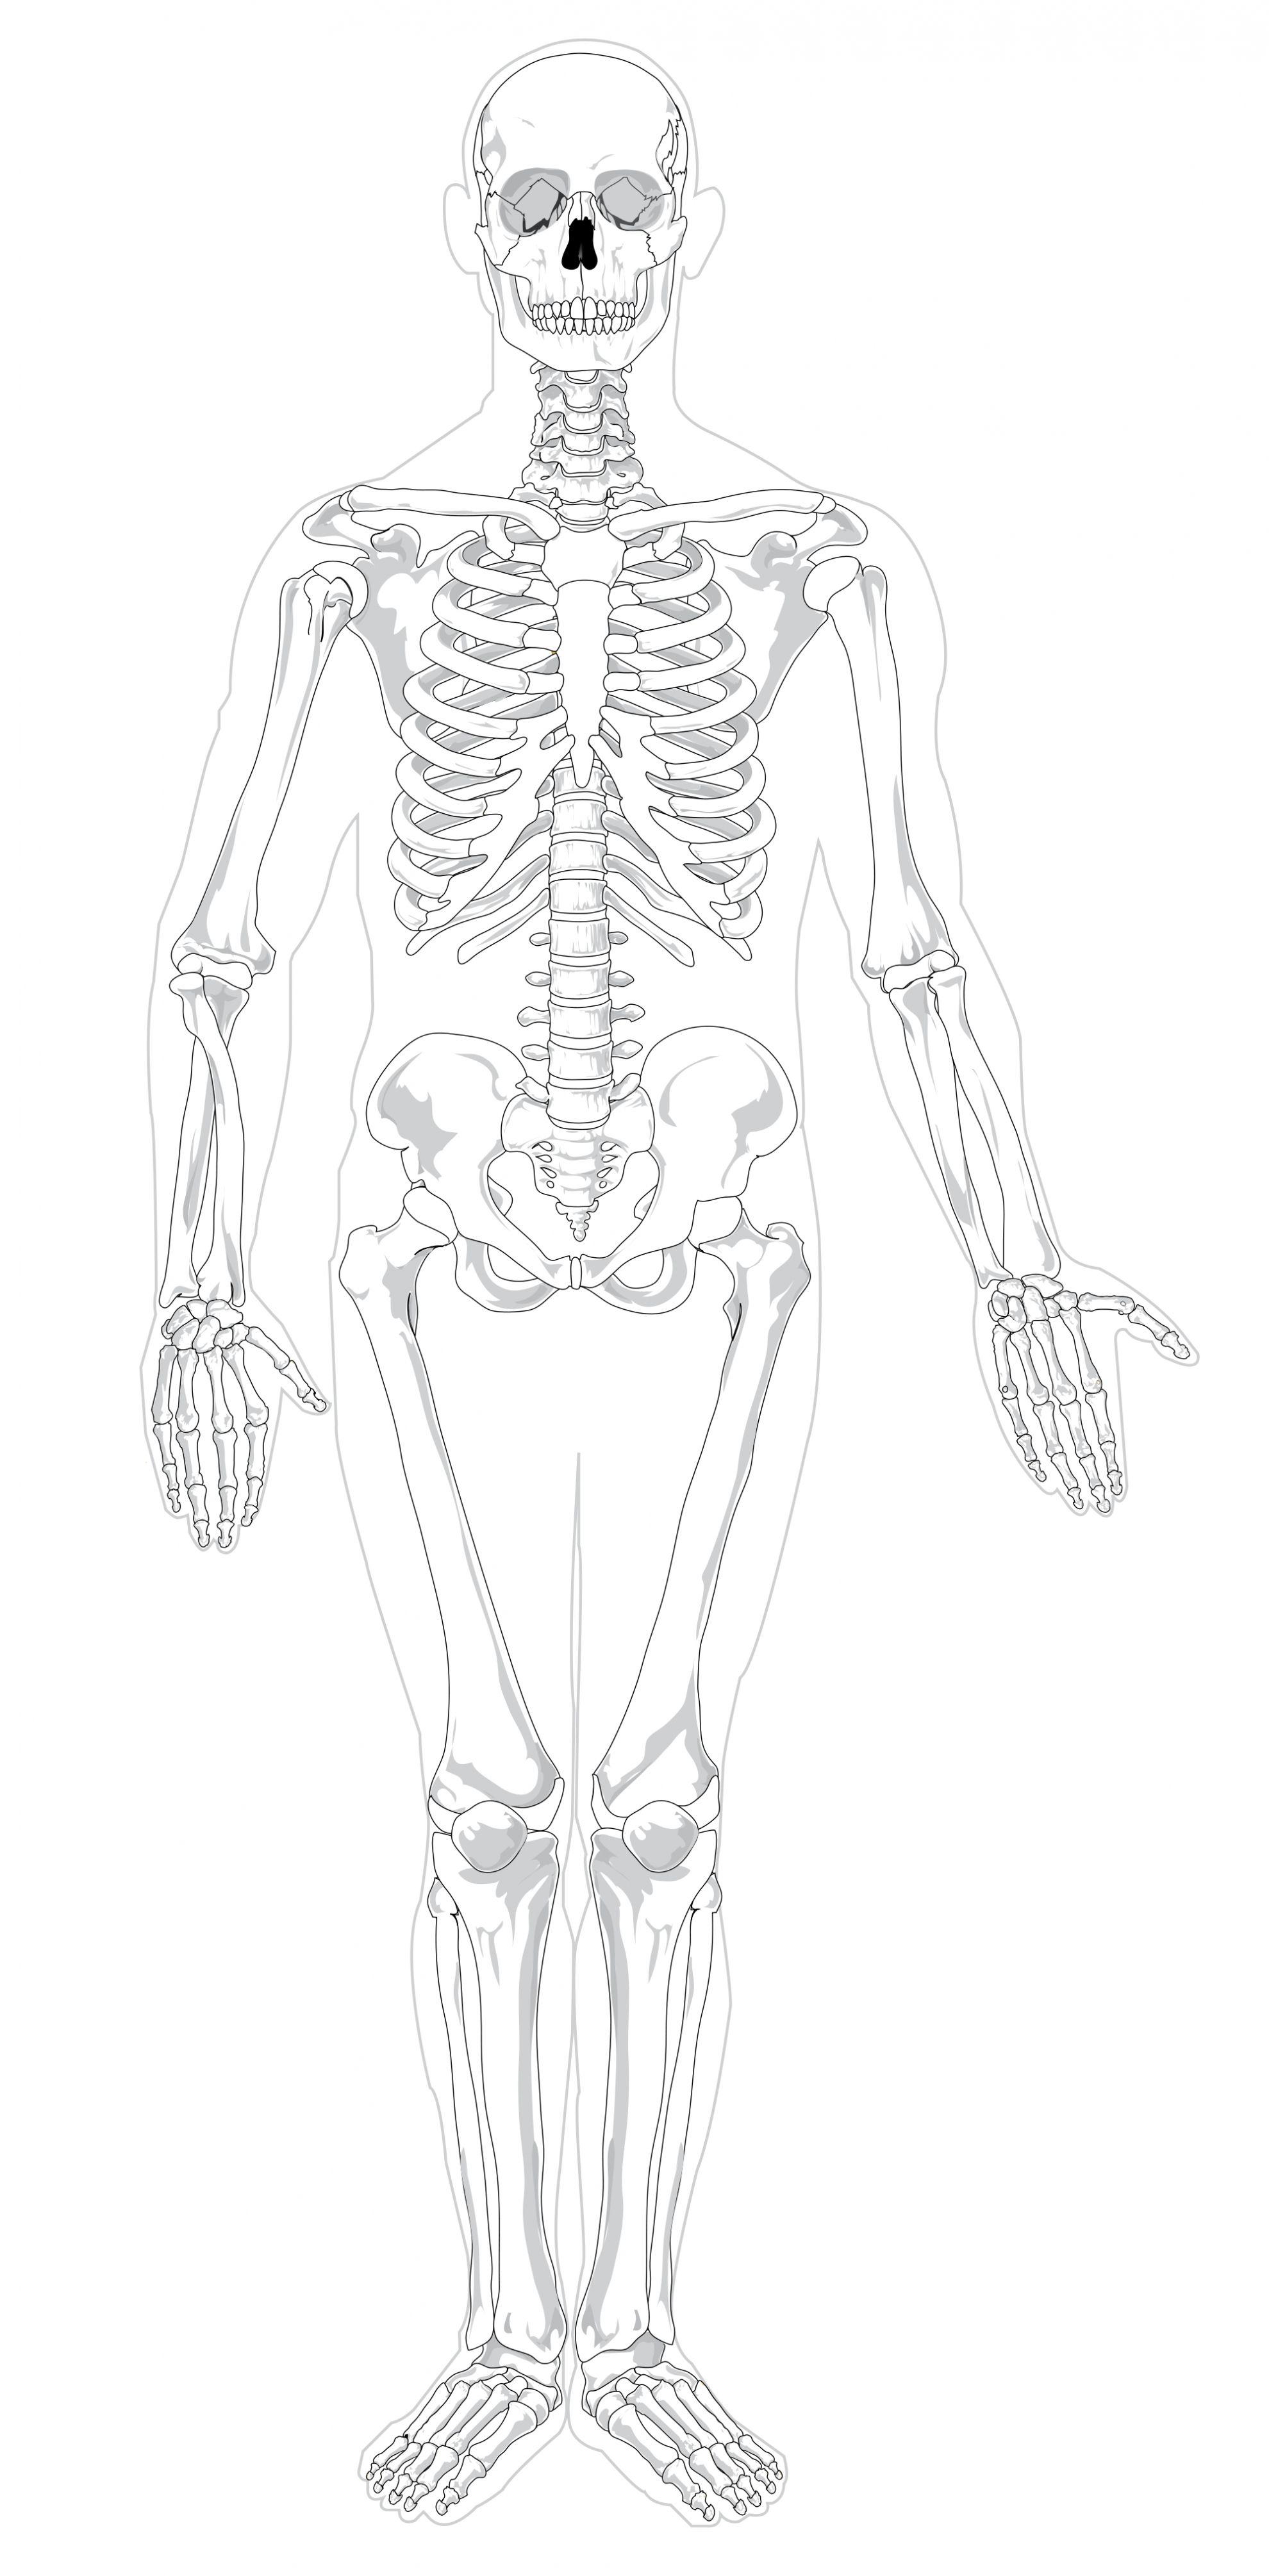 Unlabeled Diagram Of The Human Skeleton Koibana Info Human Skeleton Human Anatomy Drawing Human Skeleton Bones